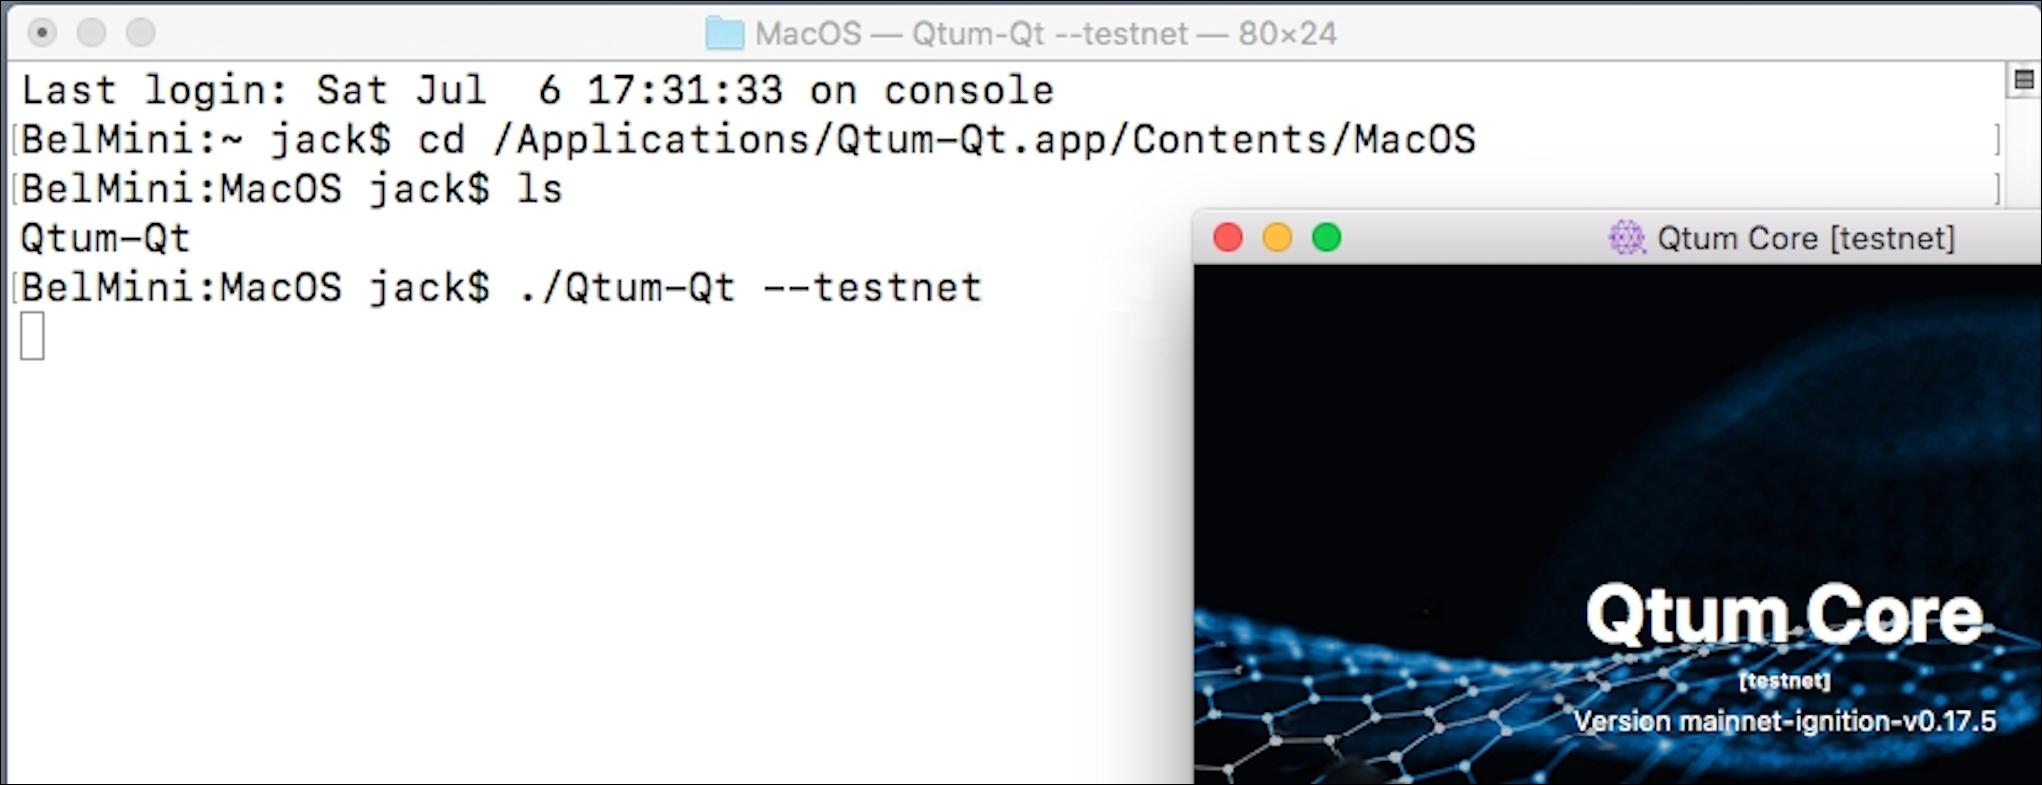 2 MacQtum-Qt--testnet